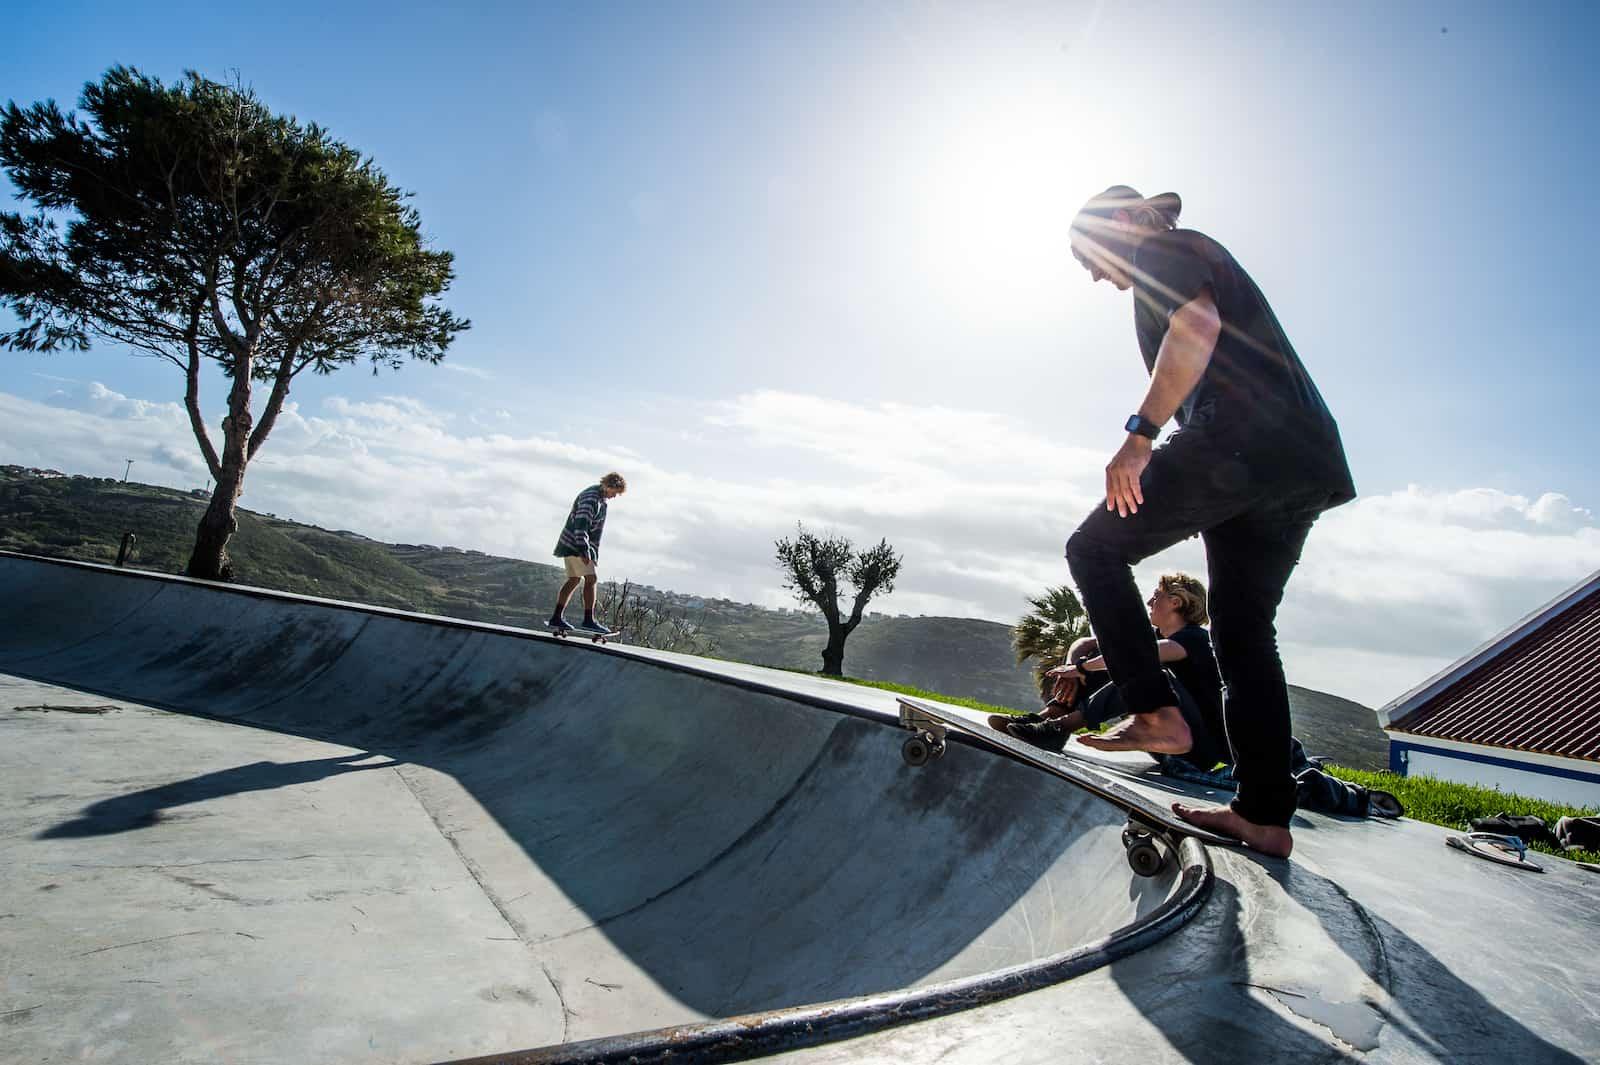 Surfskate trening i bowl fungerer ekstremt bra - Foto: Evelina Rönnbäck / lapoint